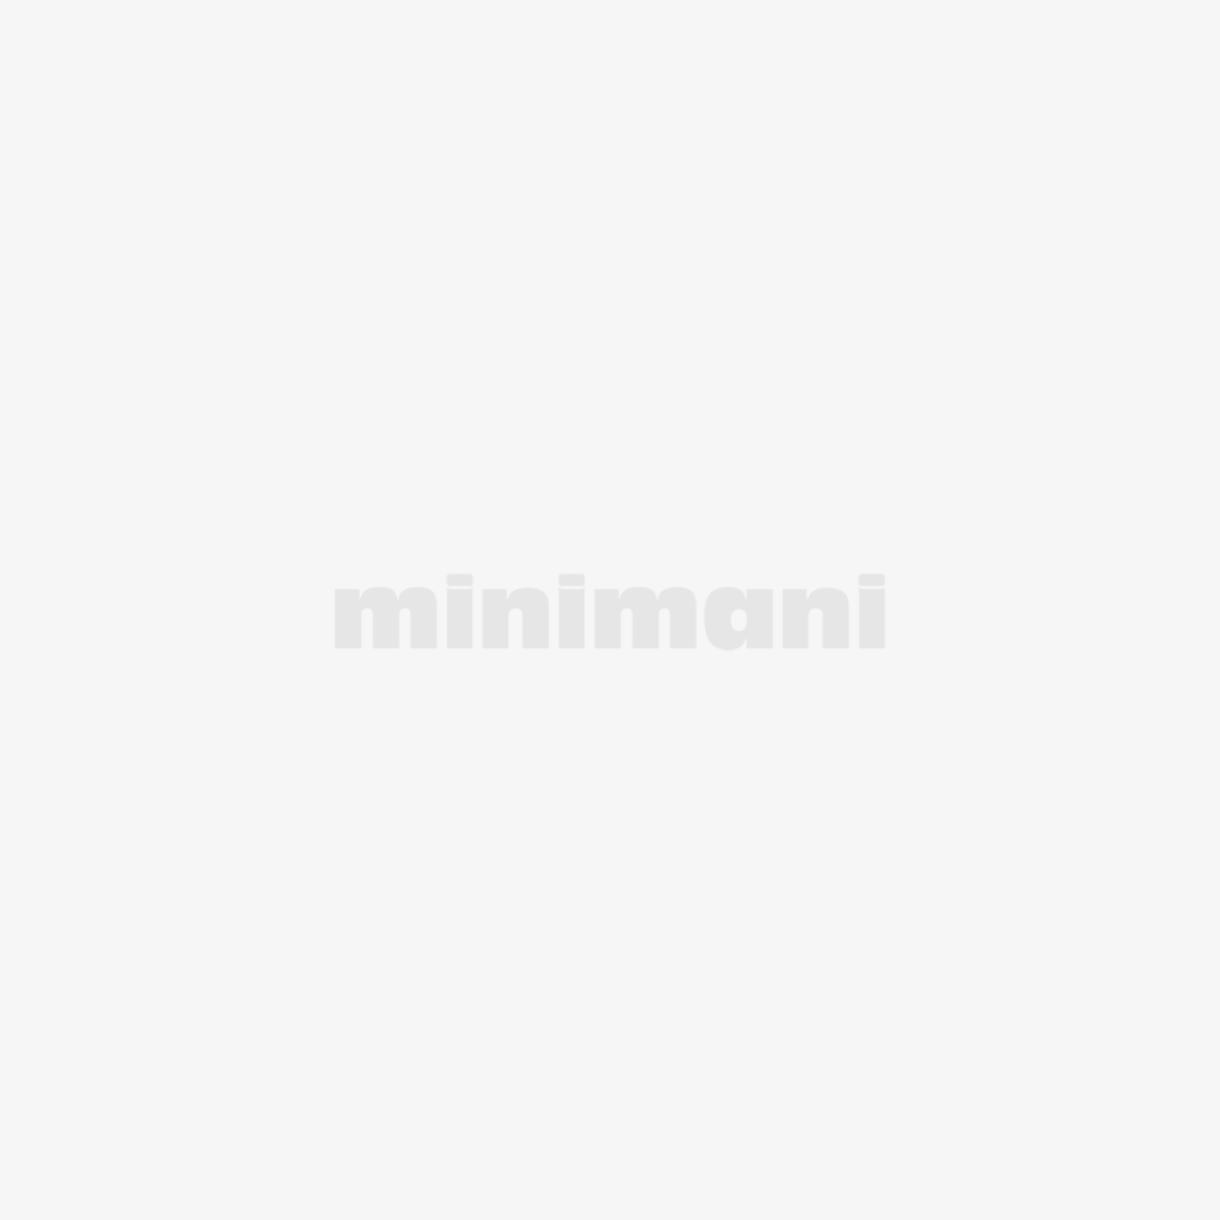 W-WRAP LIIMANPINTELI - PITUUS 4 M - LEVEYS 10 CM